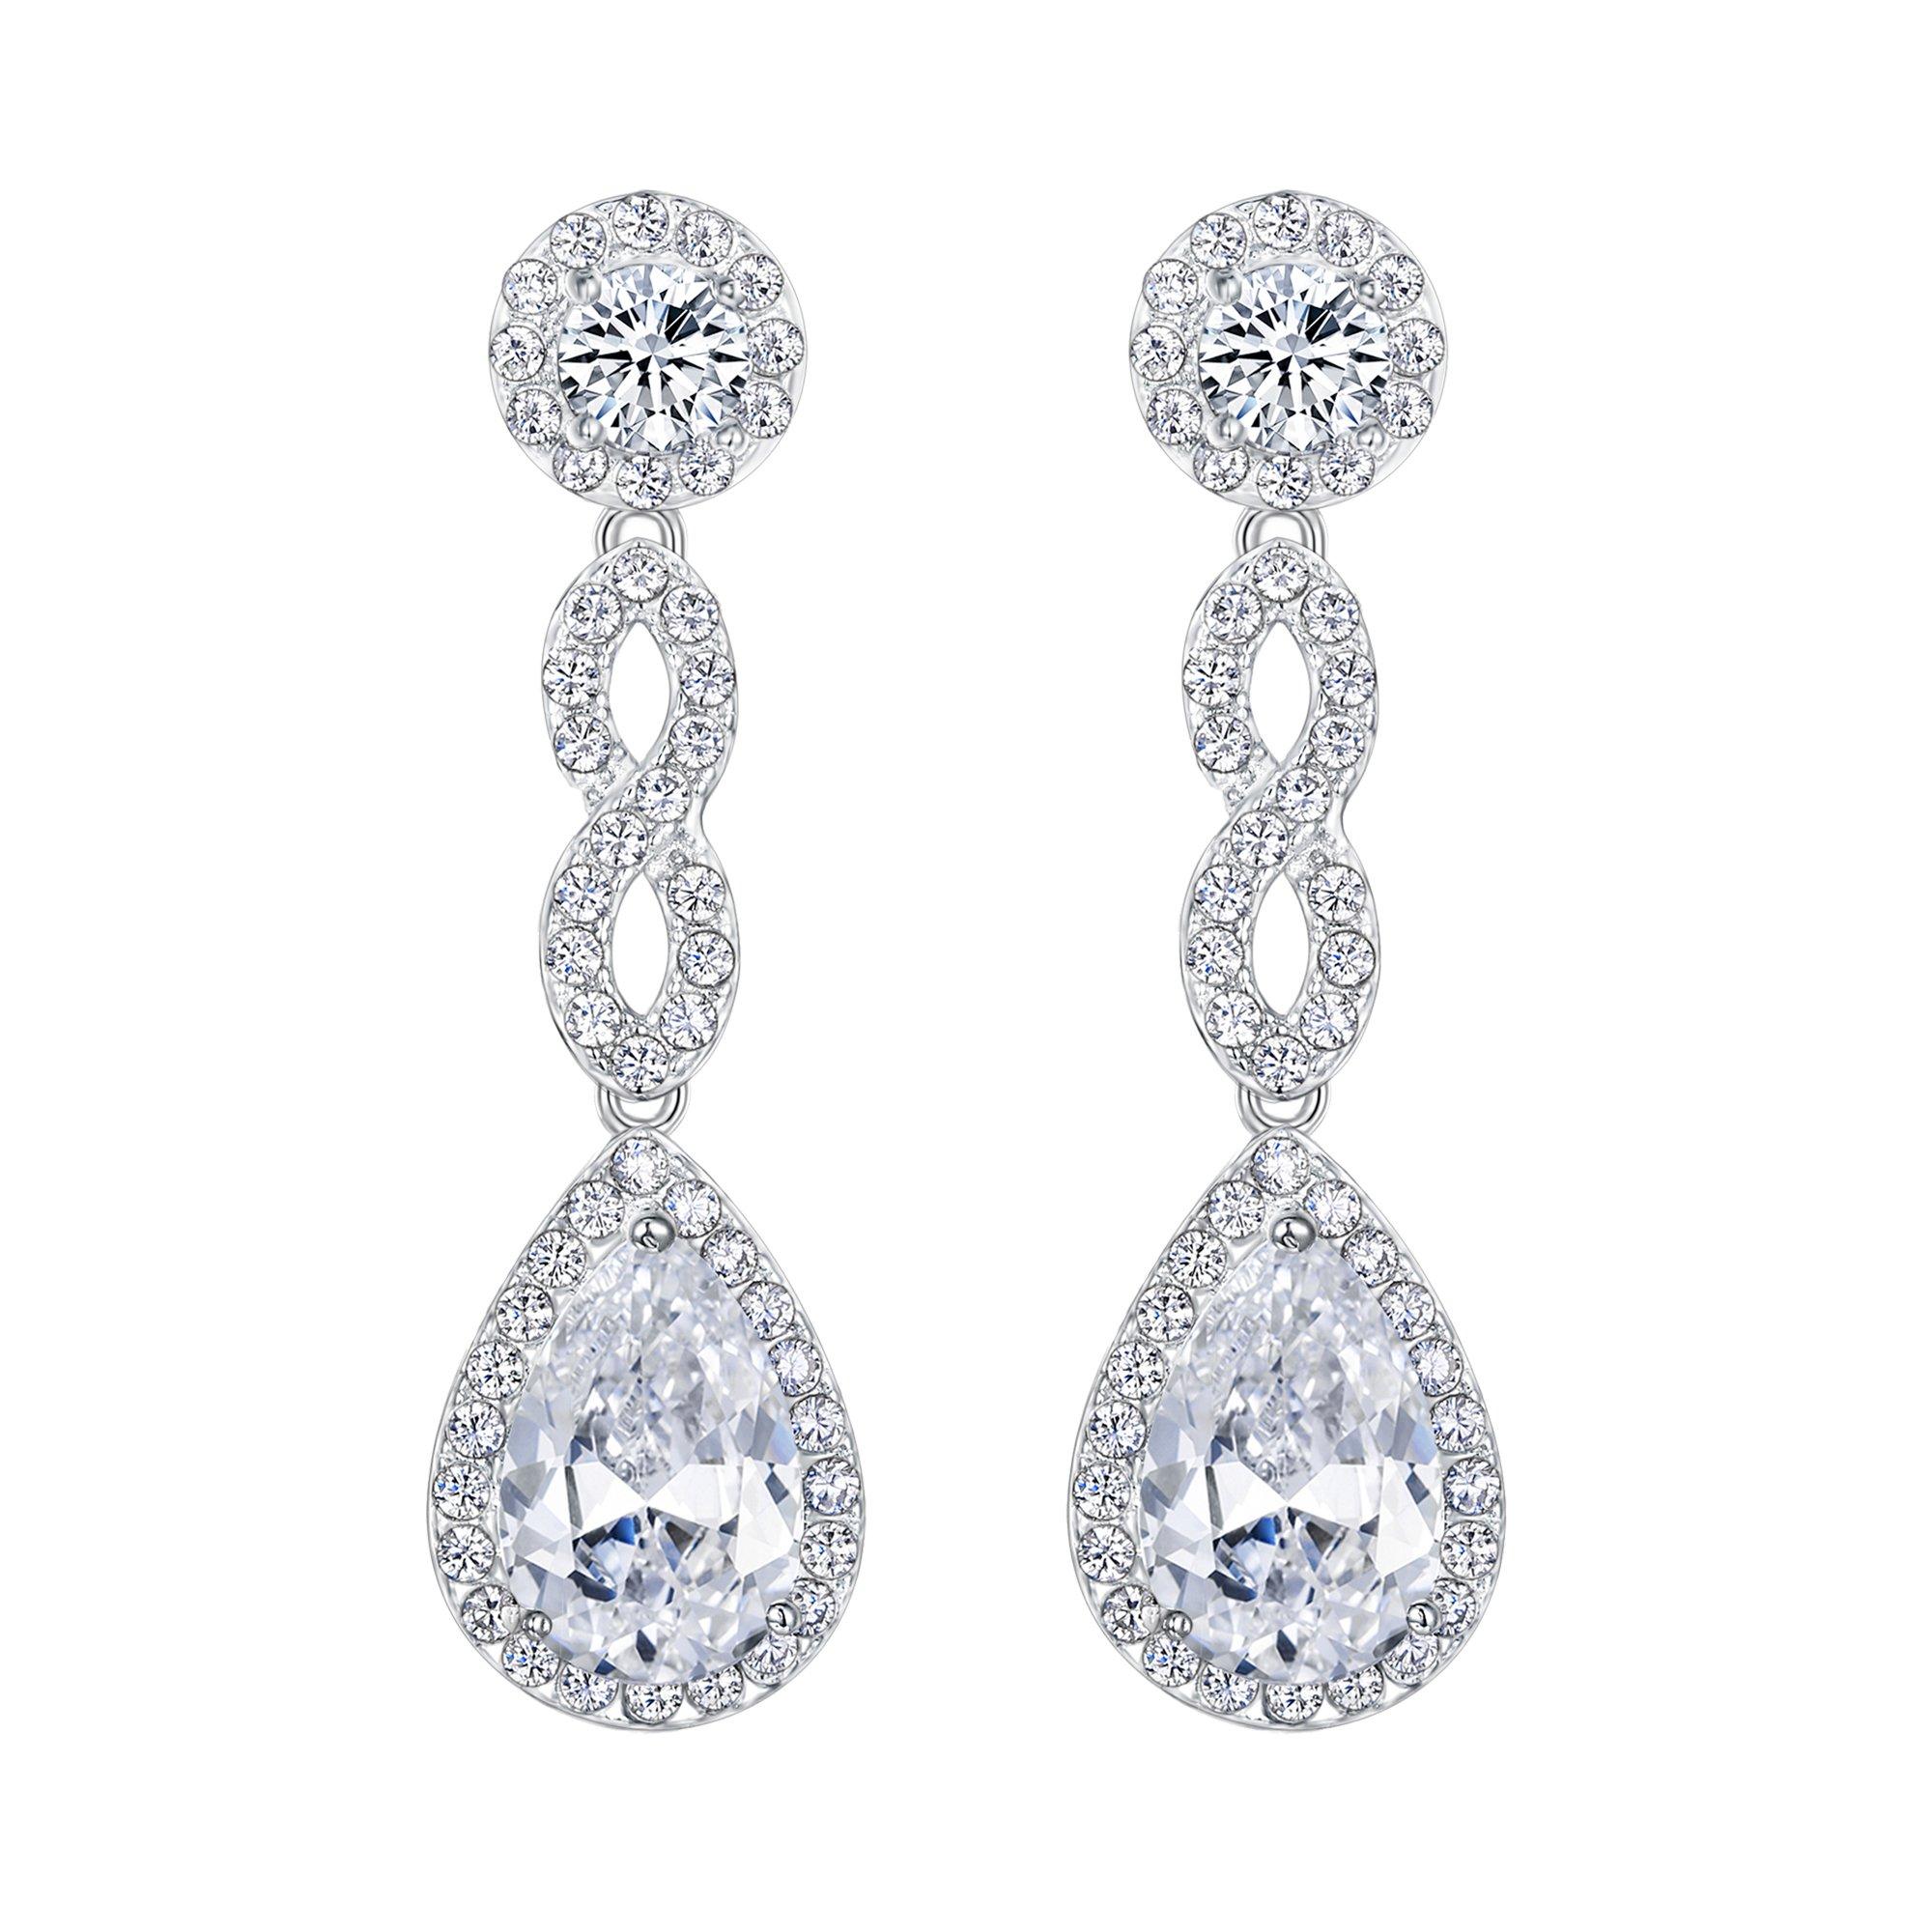 EVER FAITH Women's Cubic Zirconia 8 Shape Infinity Bridal Pierced Dangle Earrings Clear Silver-Tone